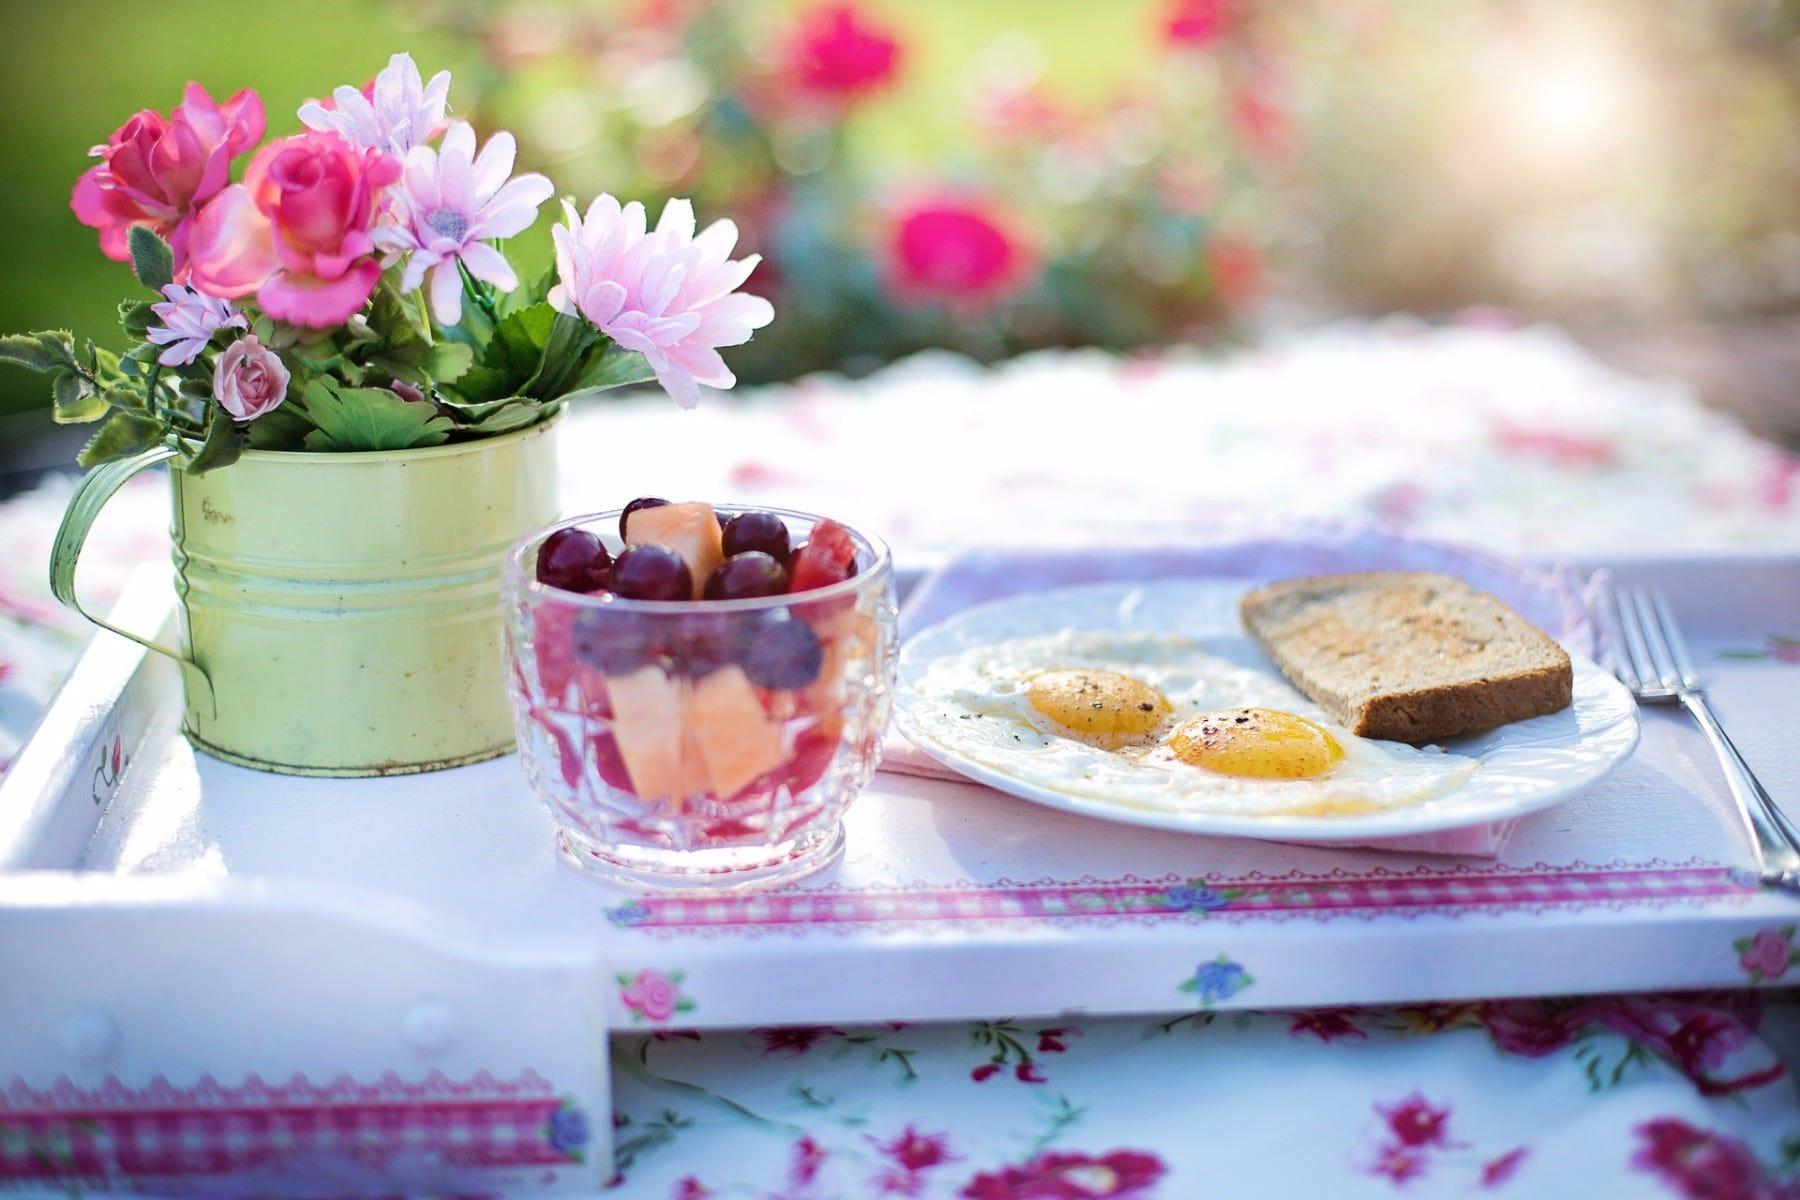 Serve mom breakfast in bed!